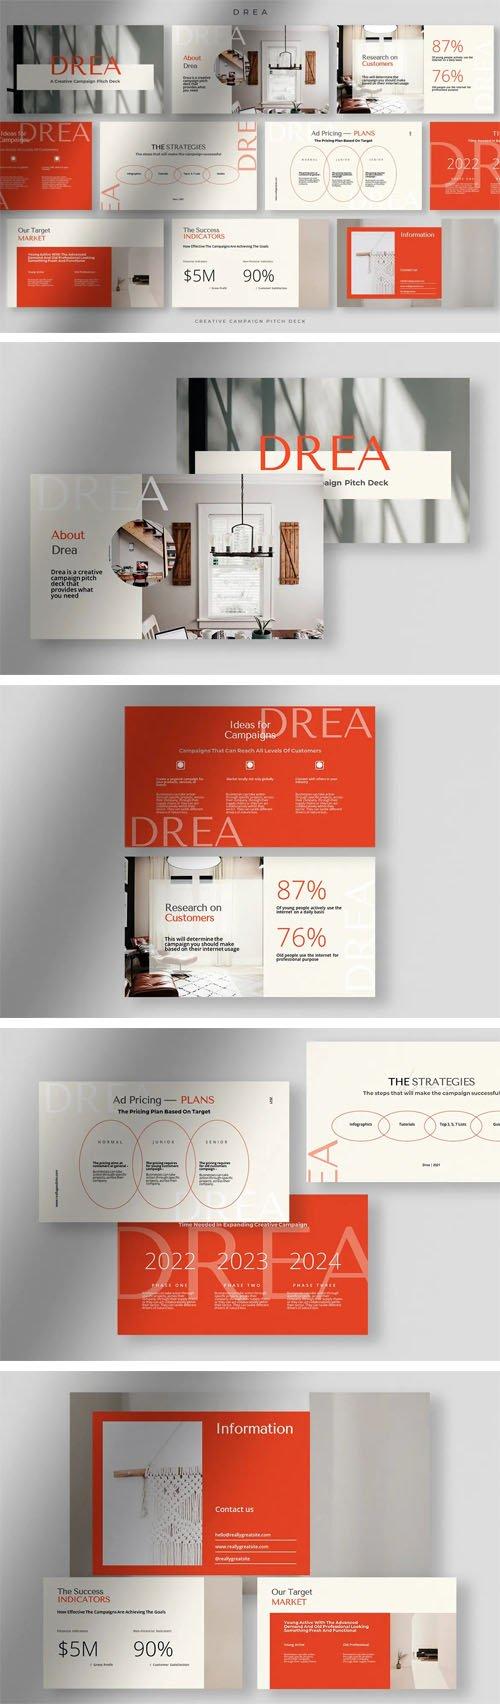 Drea - Creative Campaign Presentation Pitch Deck